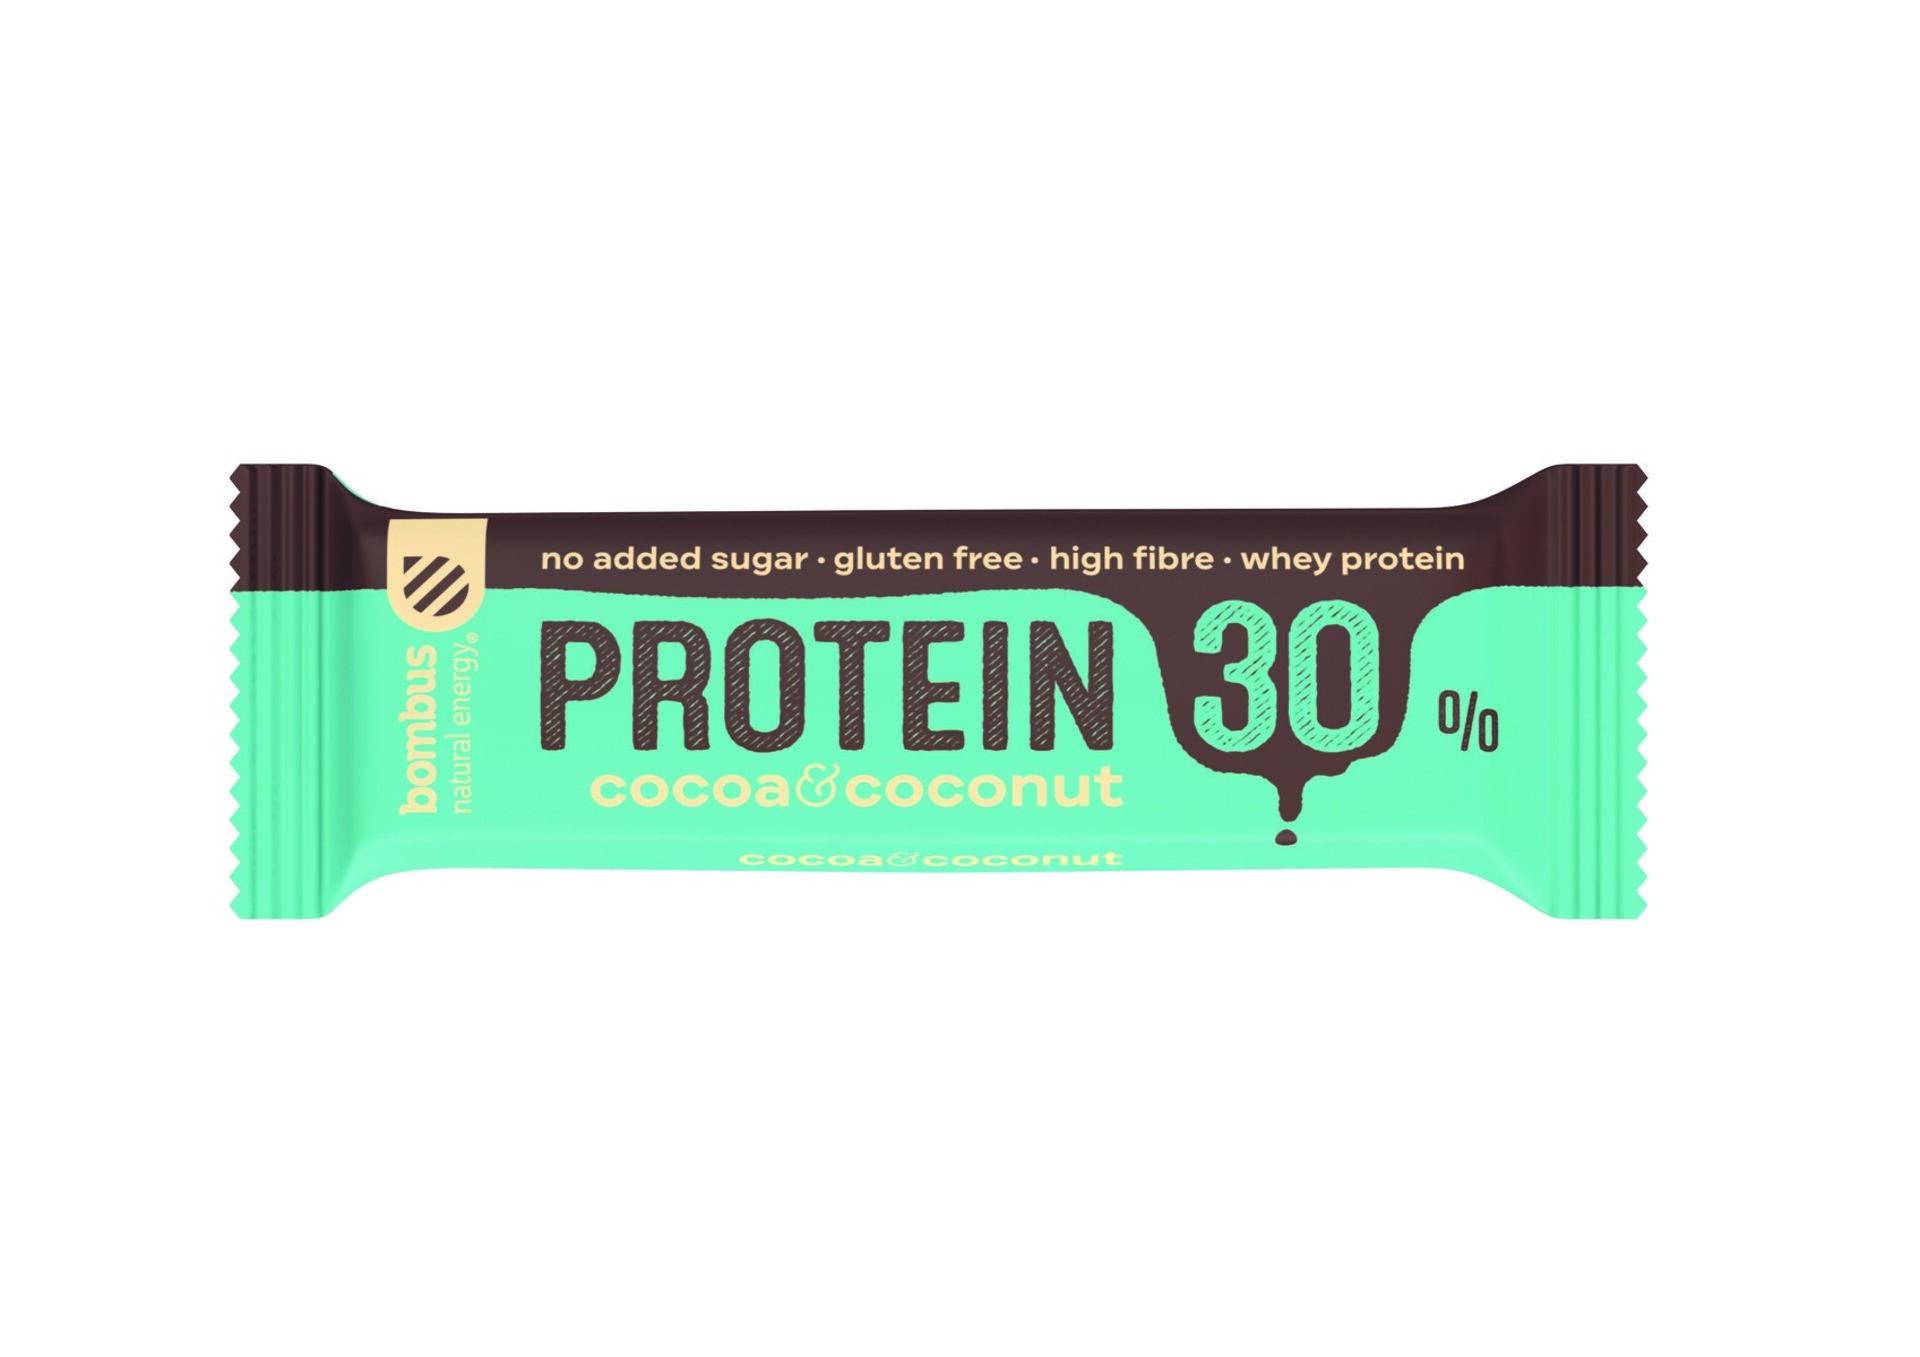 Bombus Proteín 30% Cocoa a Coconut 50 g